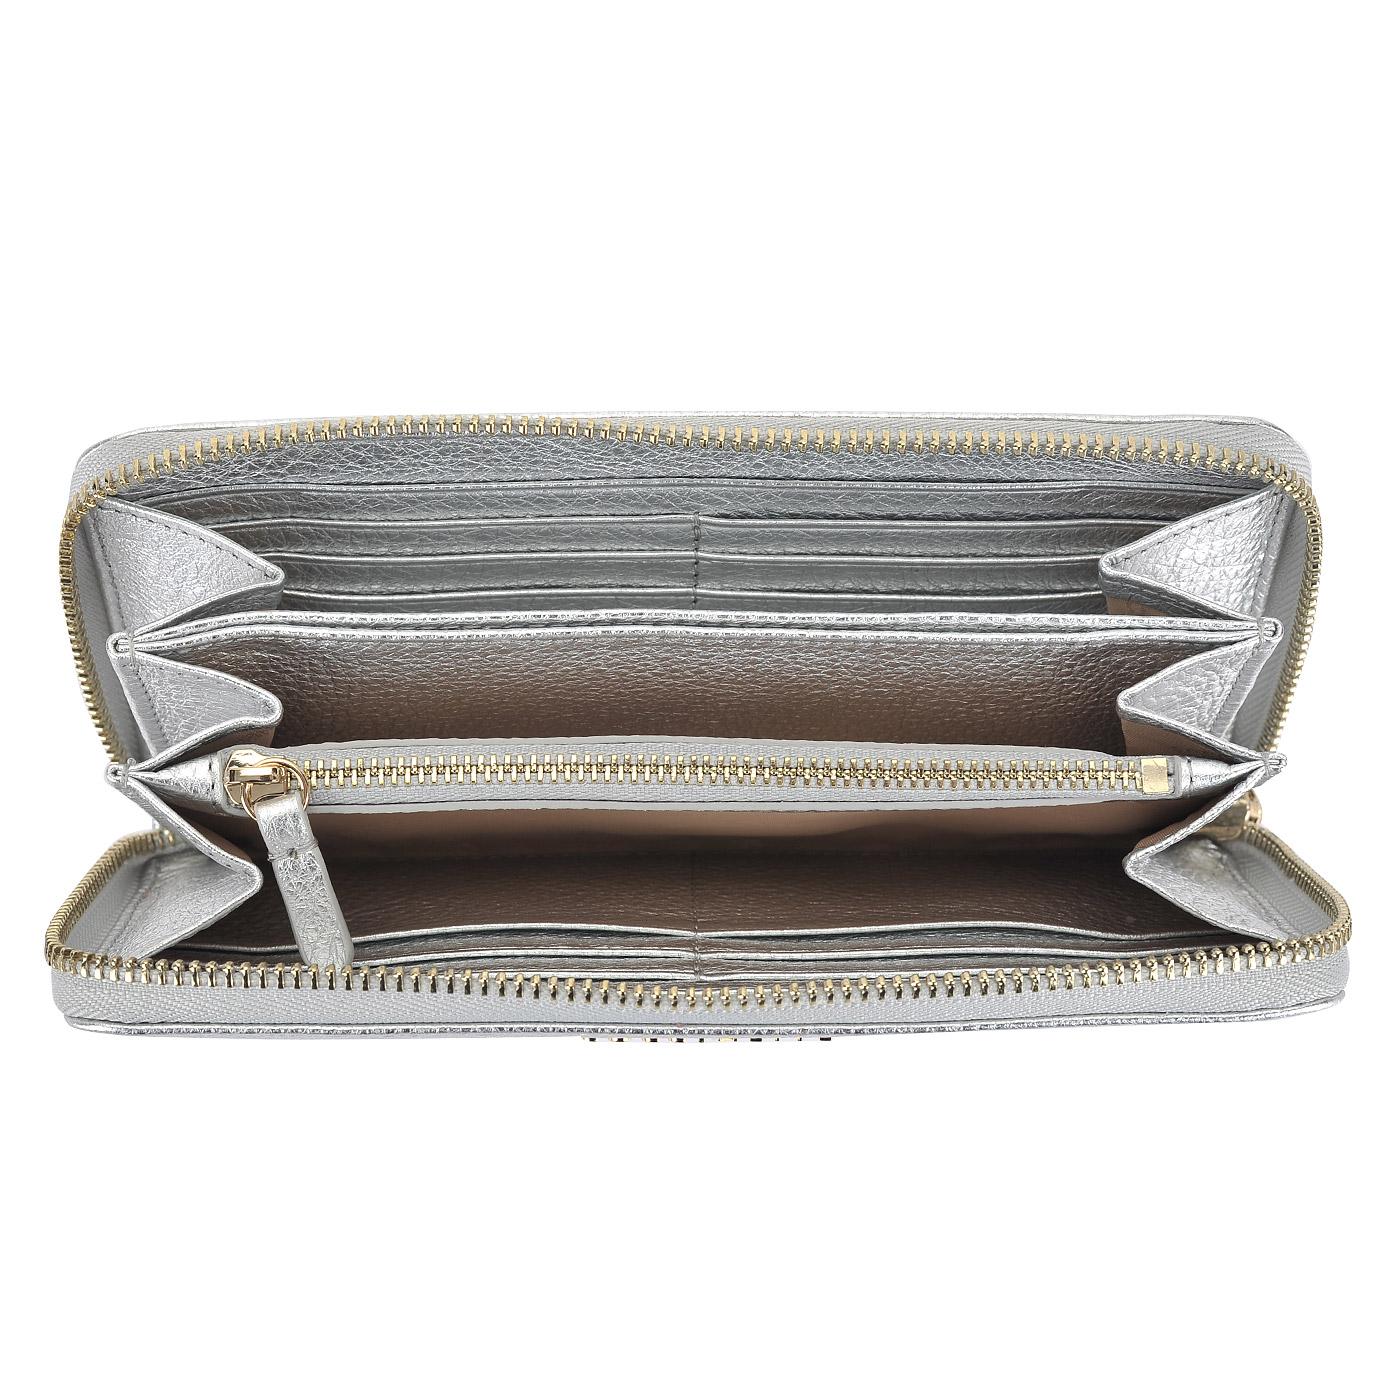 0d54d07b85a0 Женское кожаное портмоне на молнии Coccinelle Metallic Soft AW5 11 ...